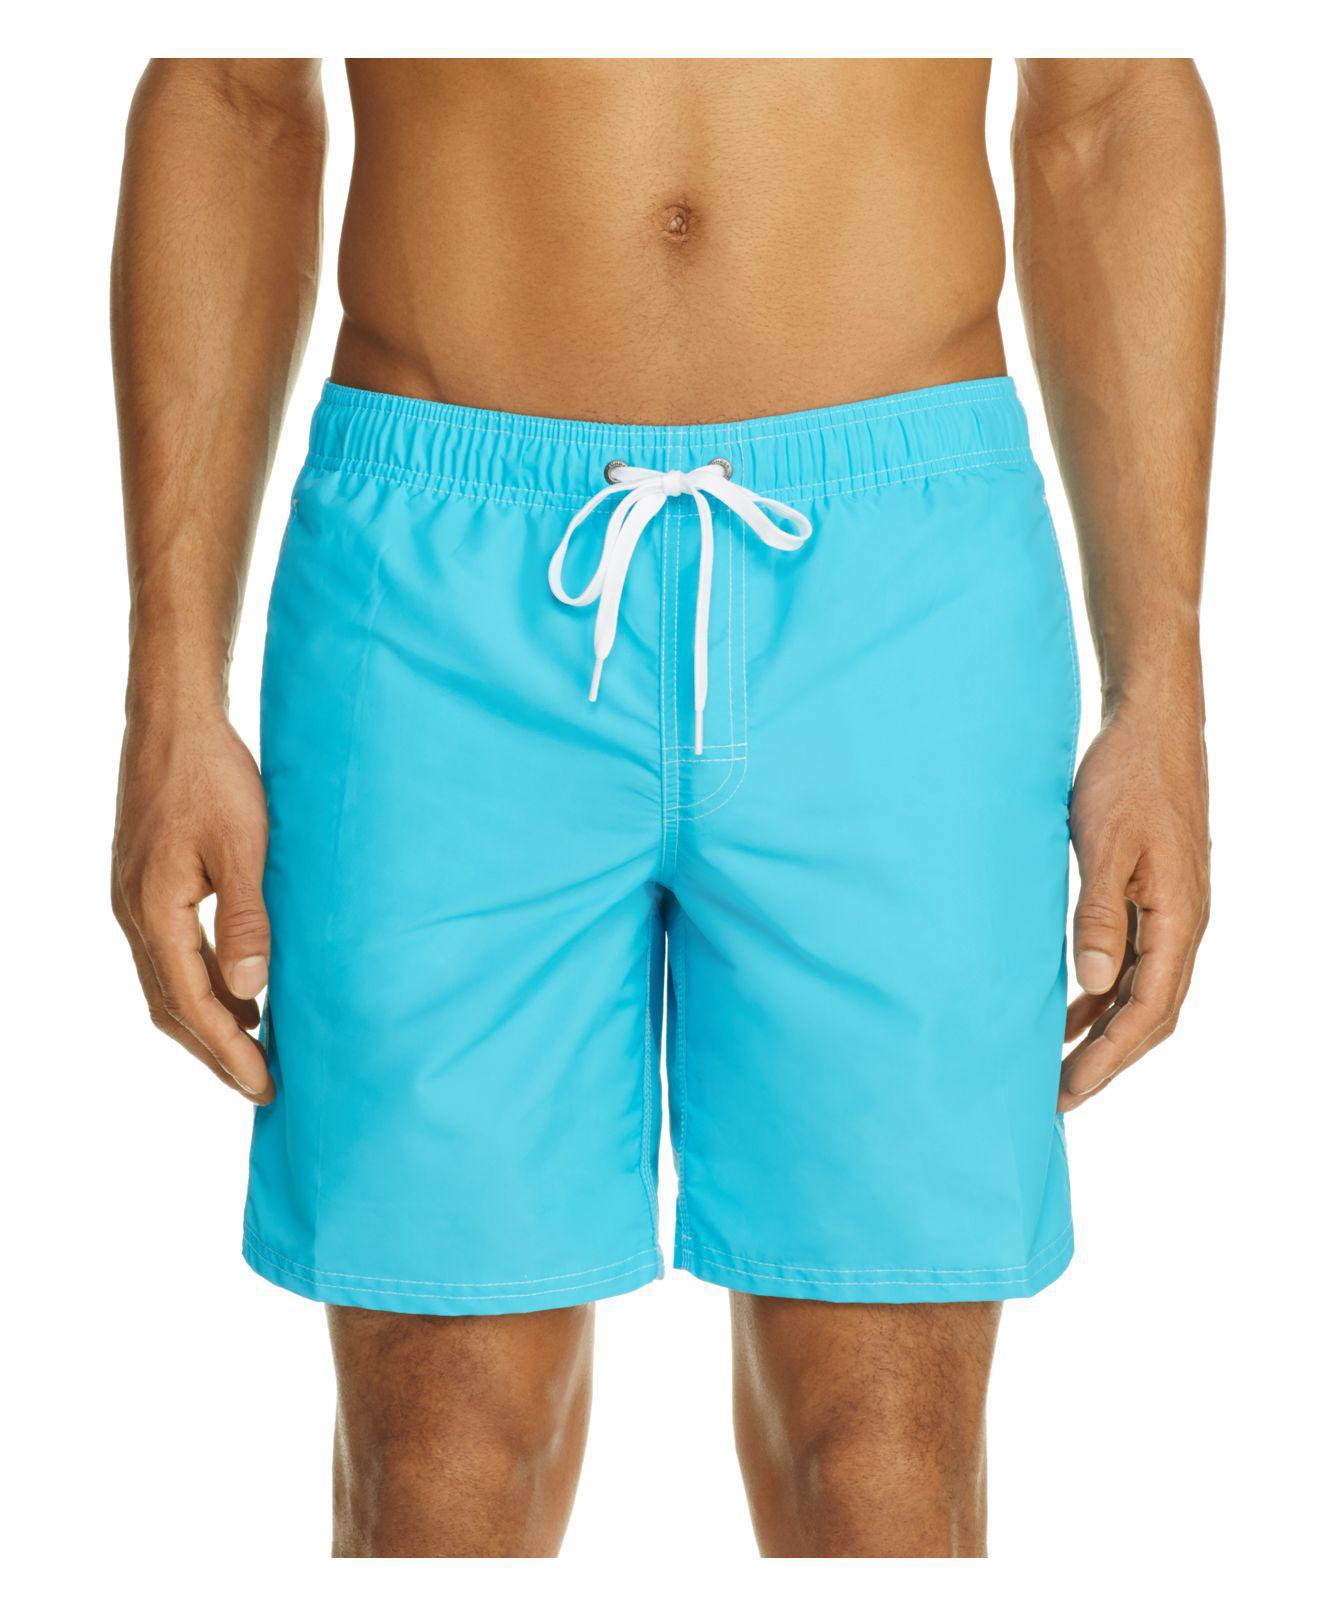 Mens Solid Swim Trunks Sundek Sale Cheap Price gK398ENea